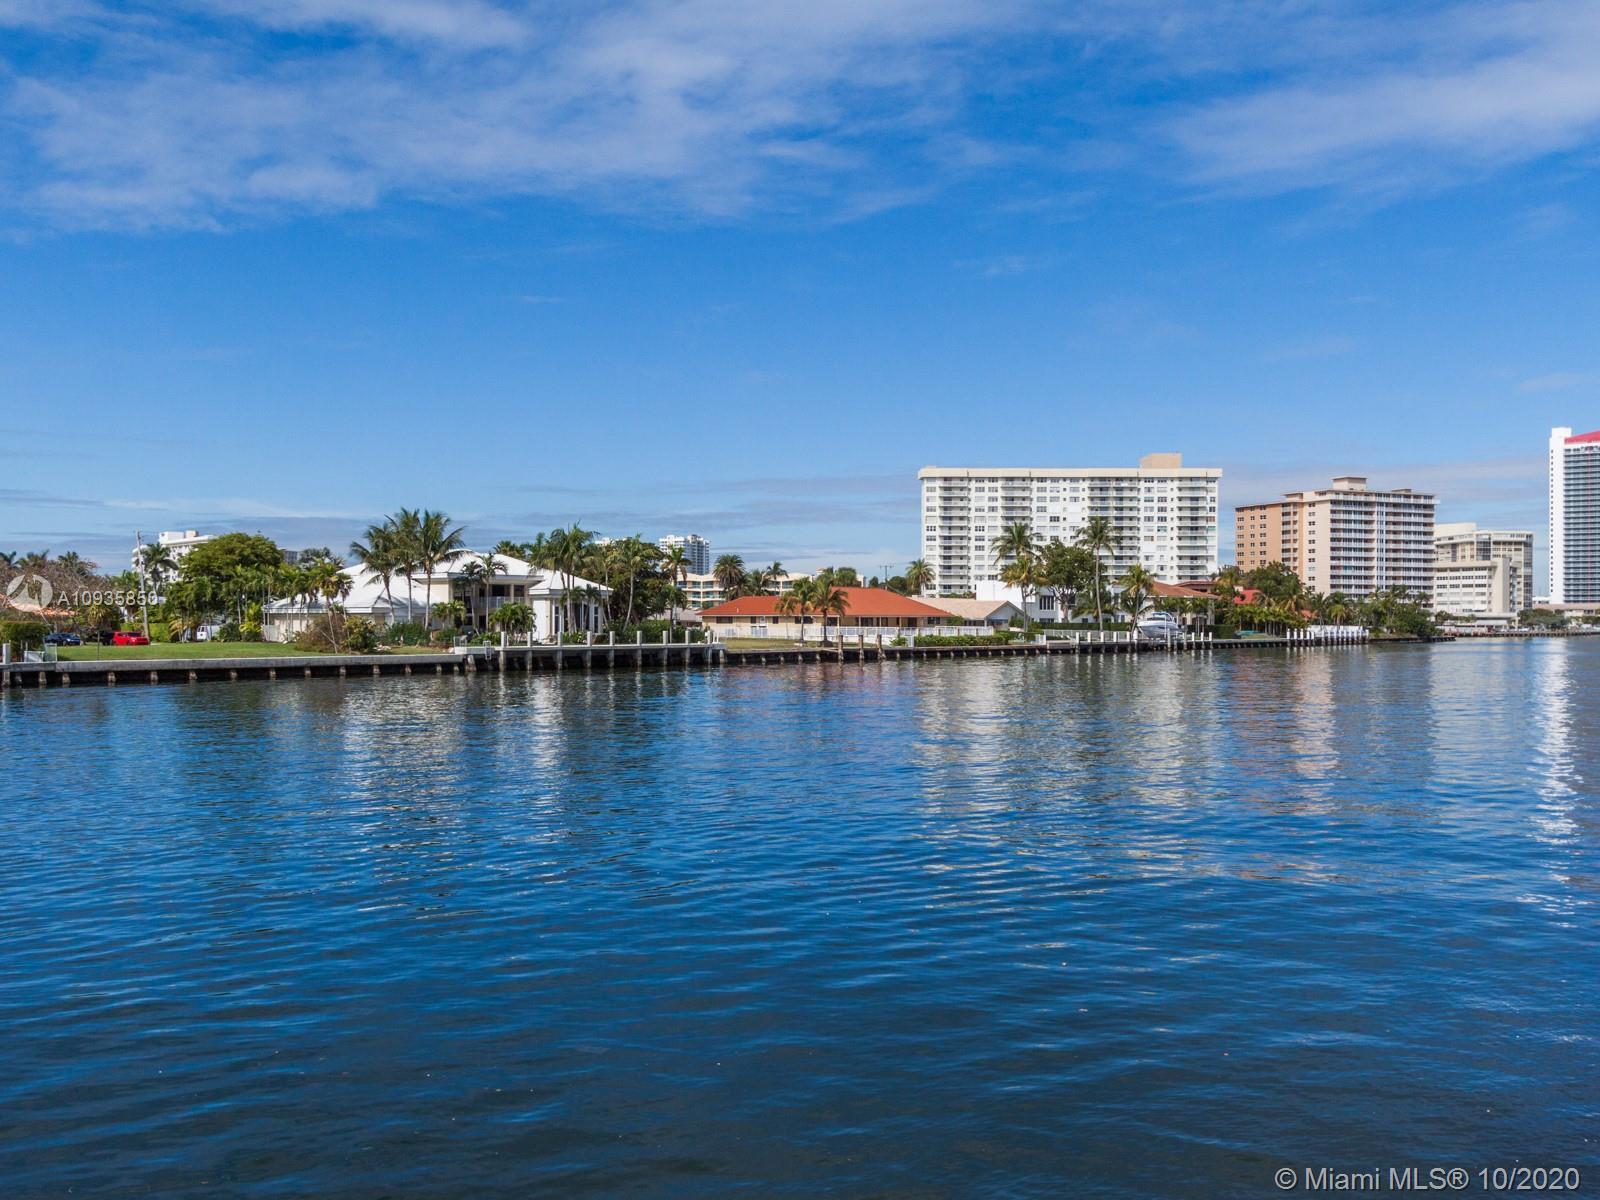 Avant Garde One #209 - 2017 S Ocean Dr #209, Hallandale Beach, FL 33009